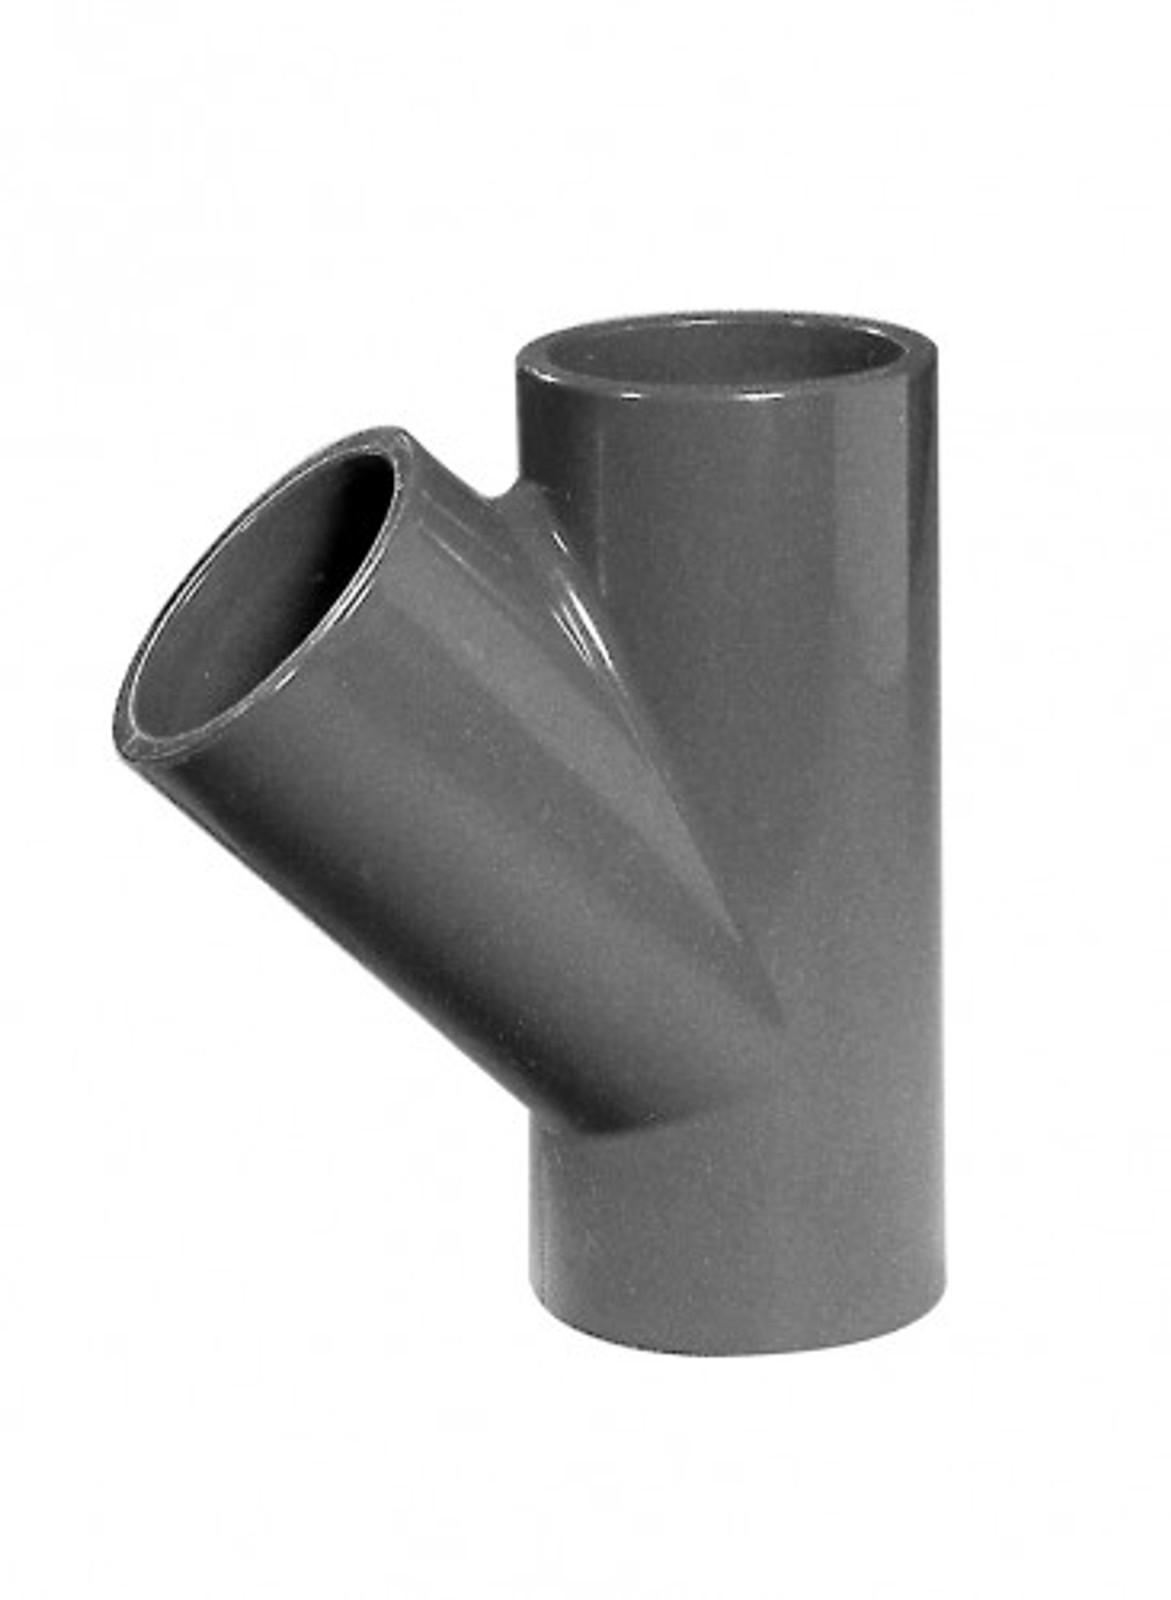 T-Stück 45°, 20 mm aus PVC